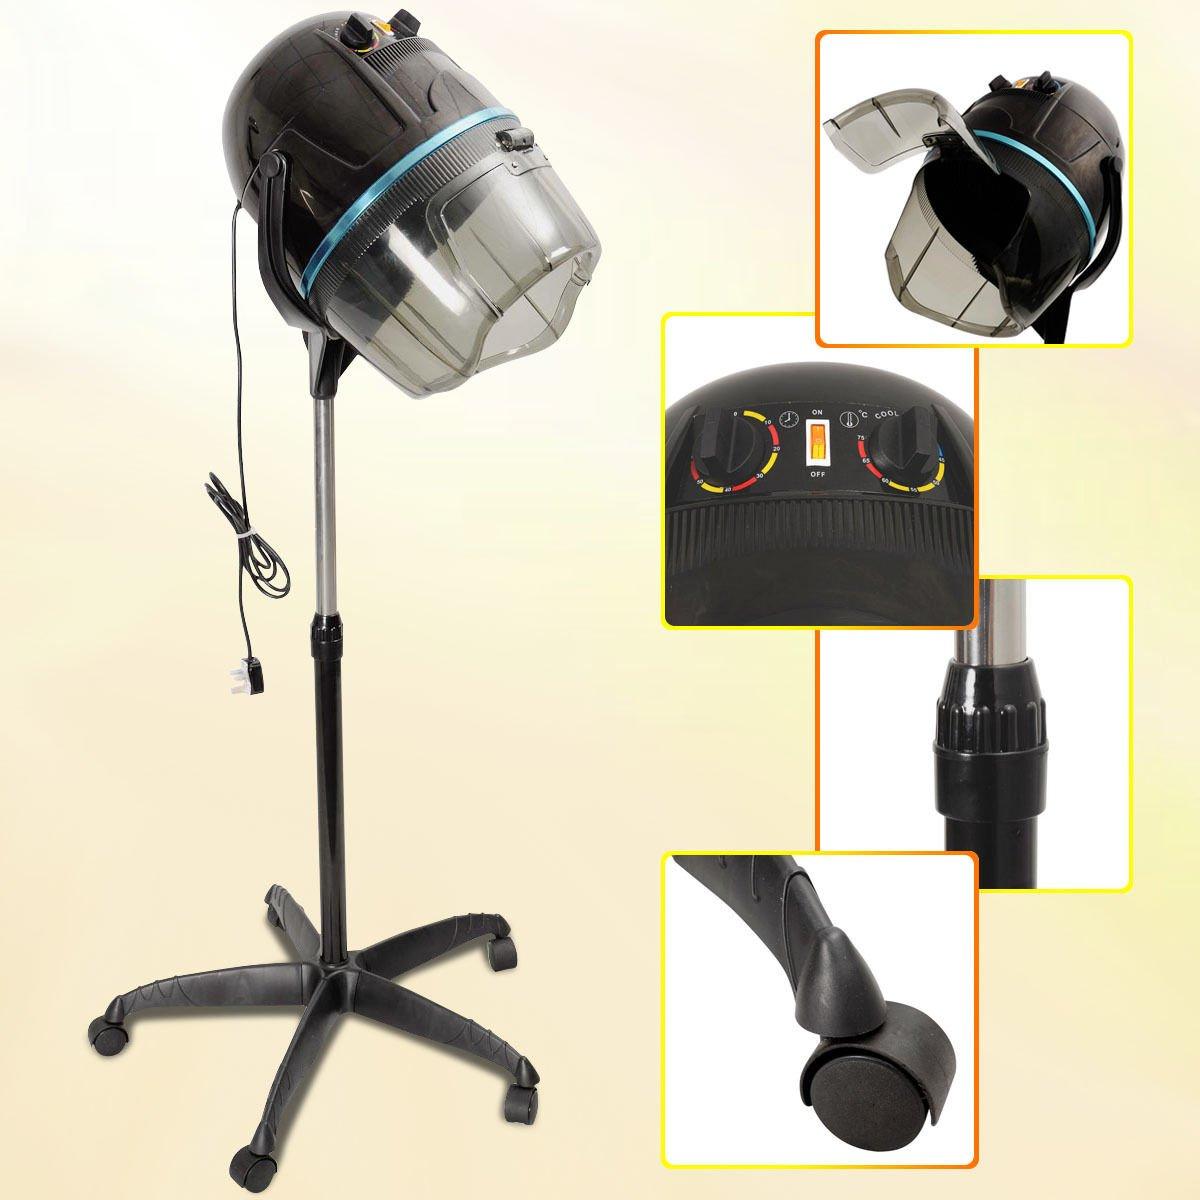 Costway Portable Hair Dryer Hood Salon Hairdryer Stand Professional Hairdresser Floor